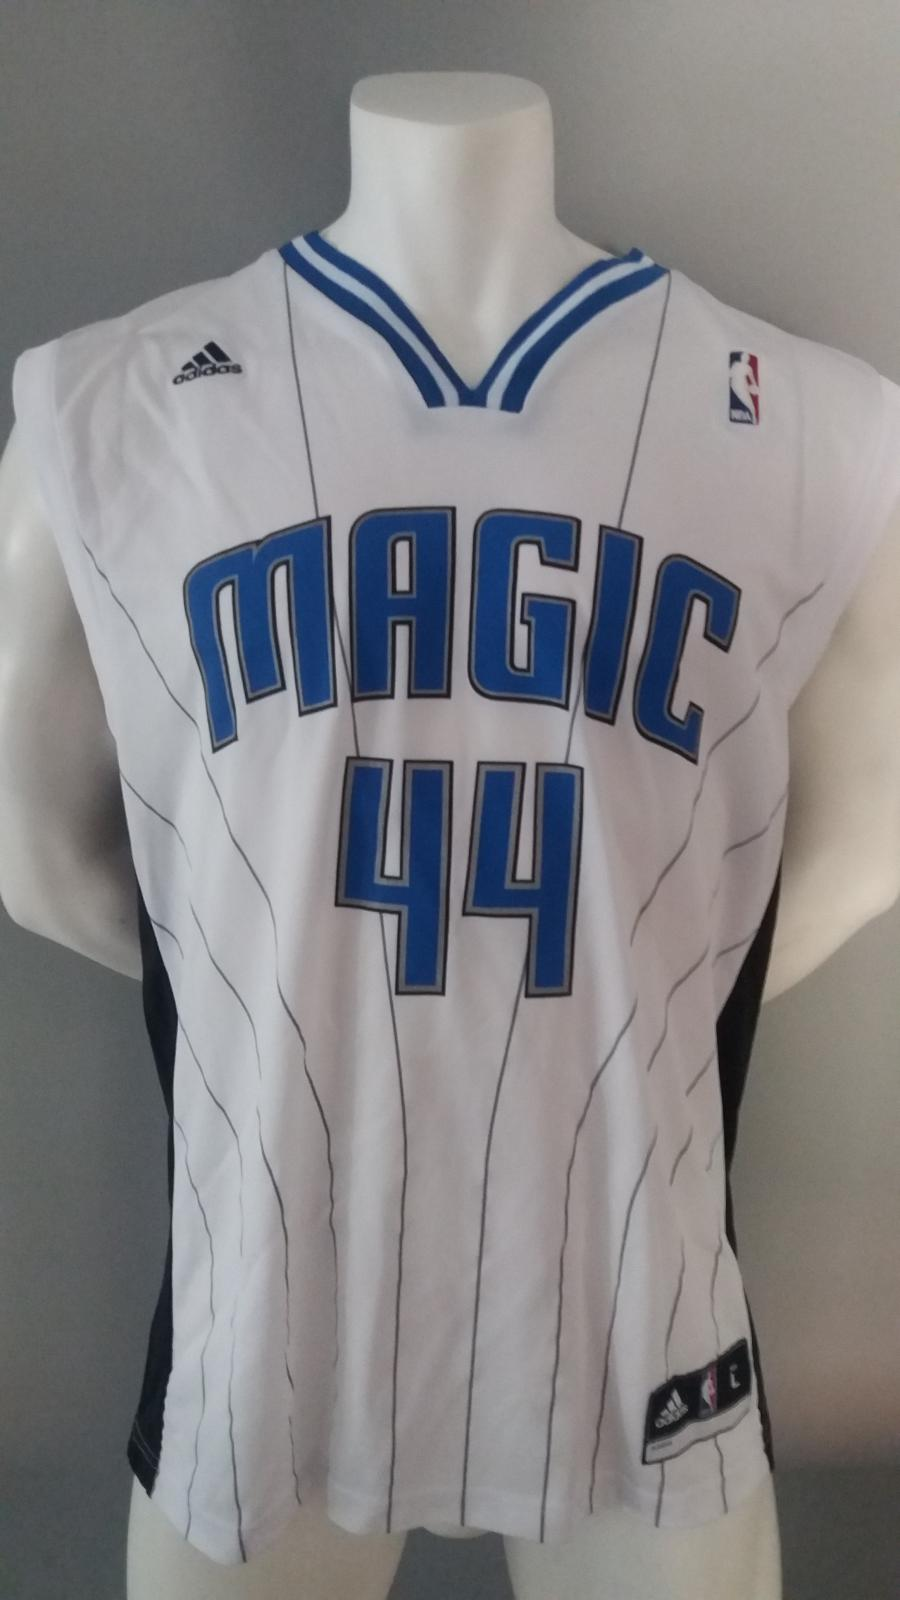 Jersey - Replica - Hombre - Andrew Nicholson - Orlando Magic - Home - Adidas